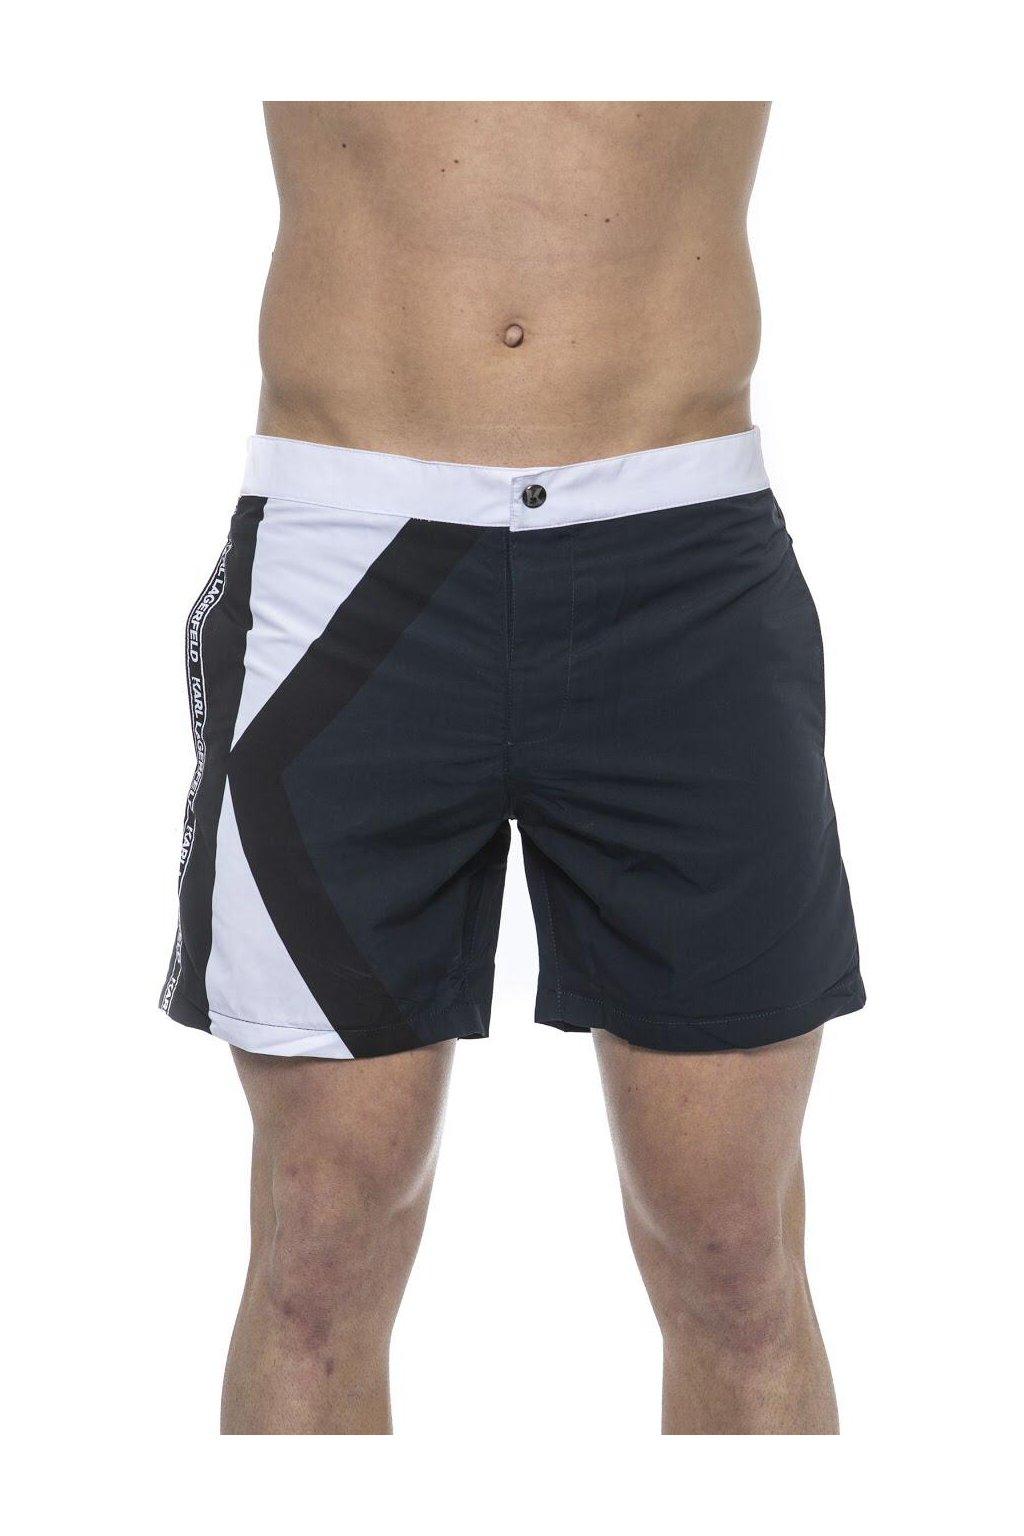 Znackove plavky Karl Lagerfeld Modre (1)